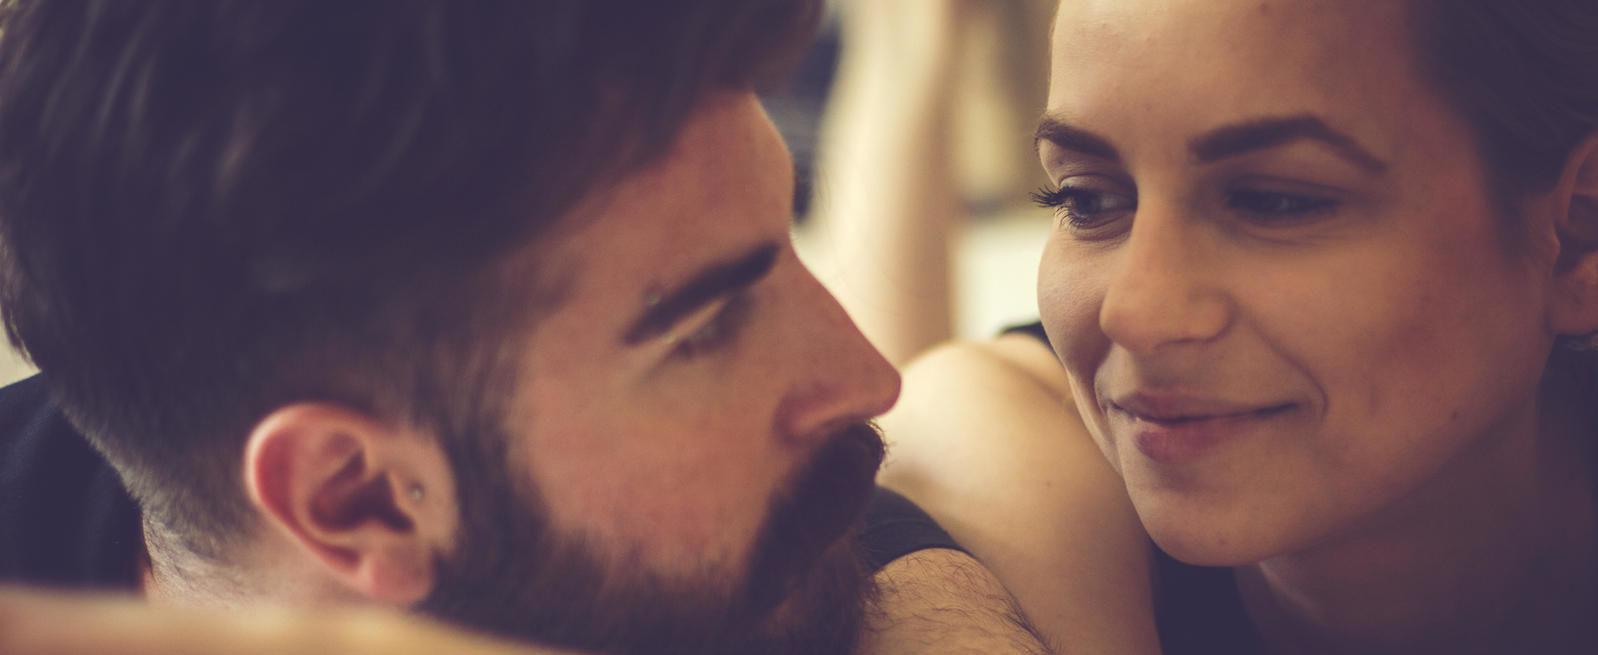 Тонкости и секреты секса